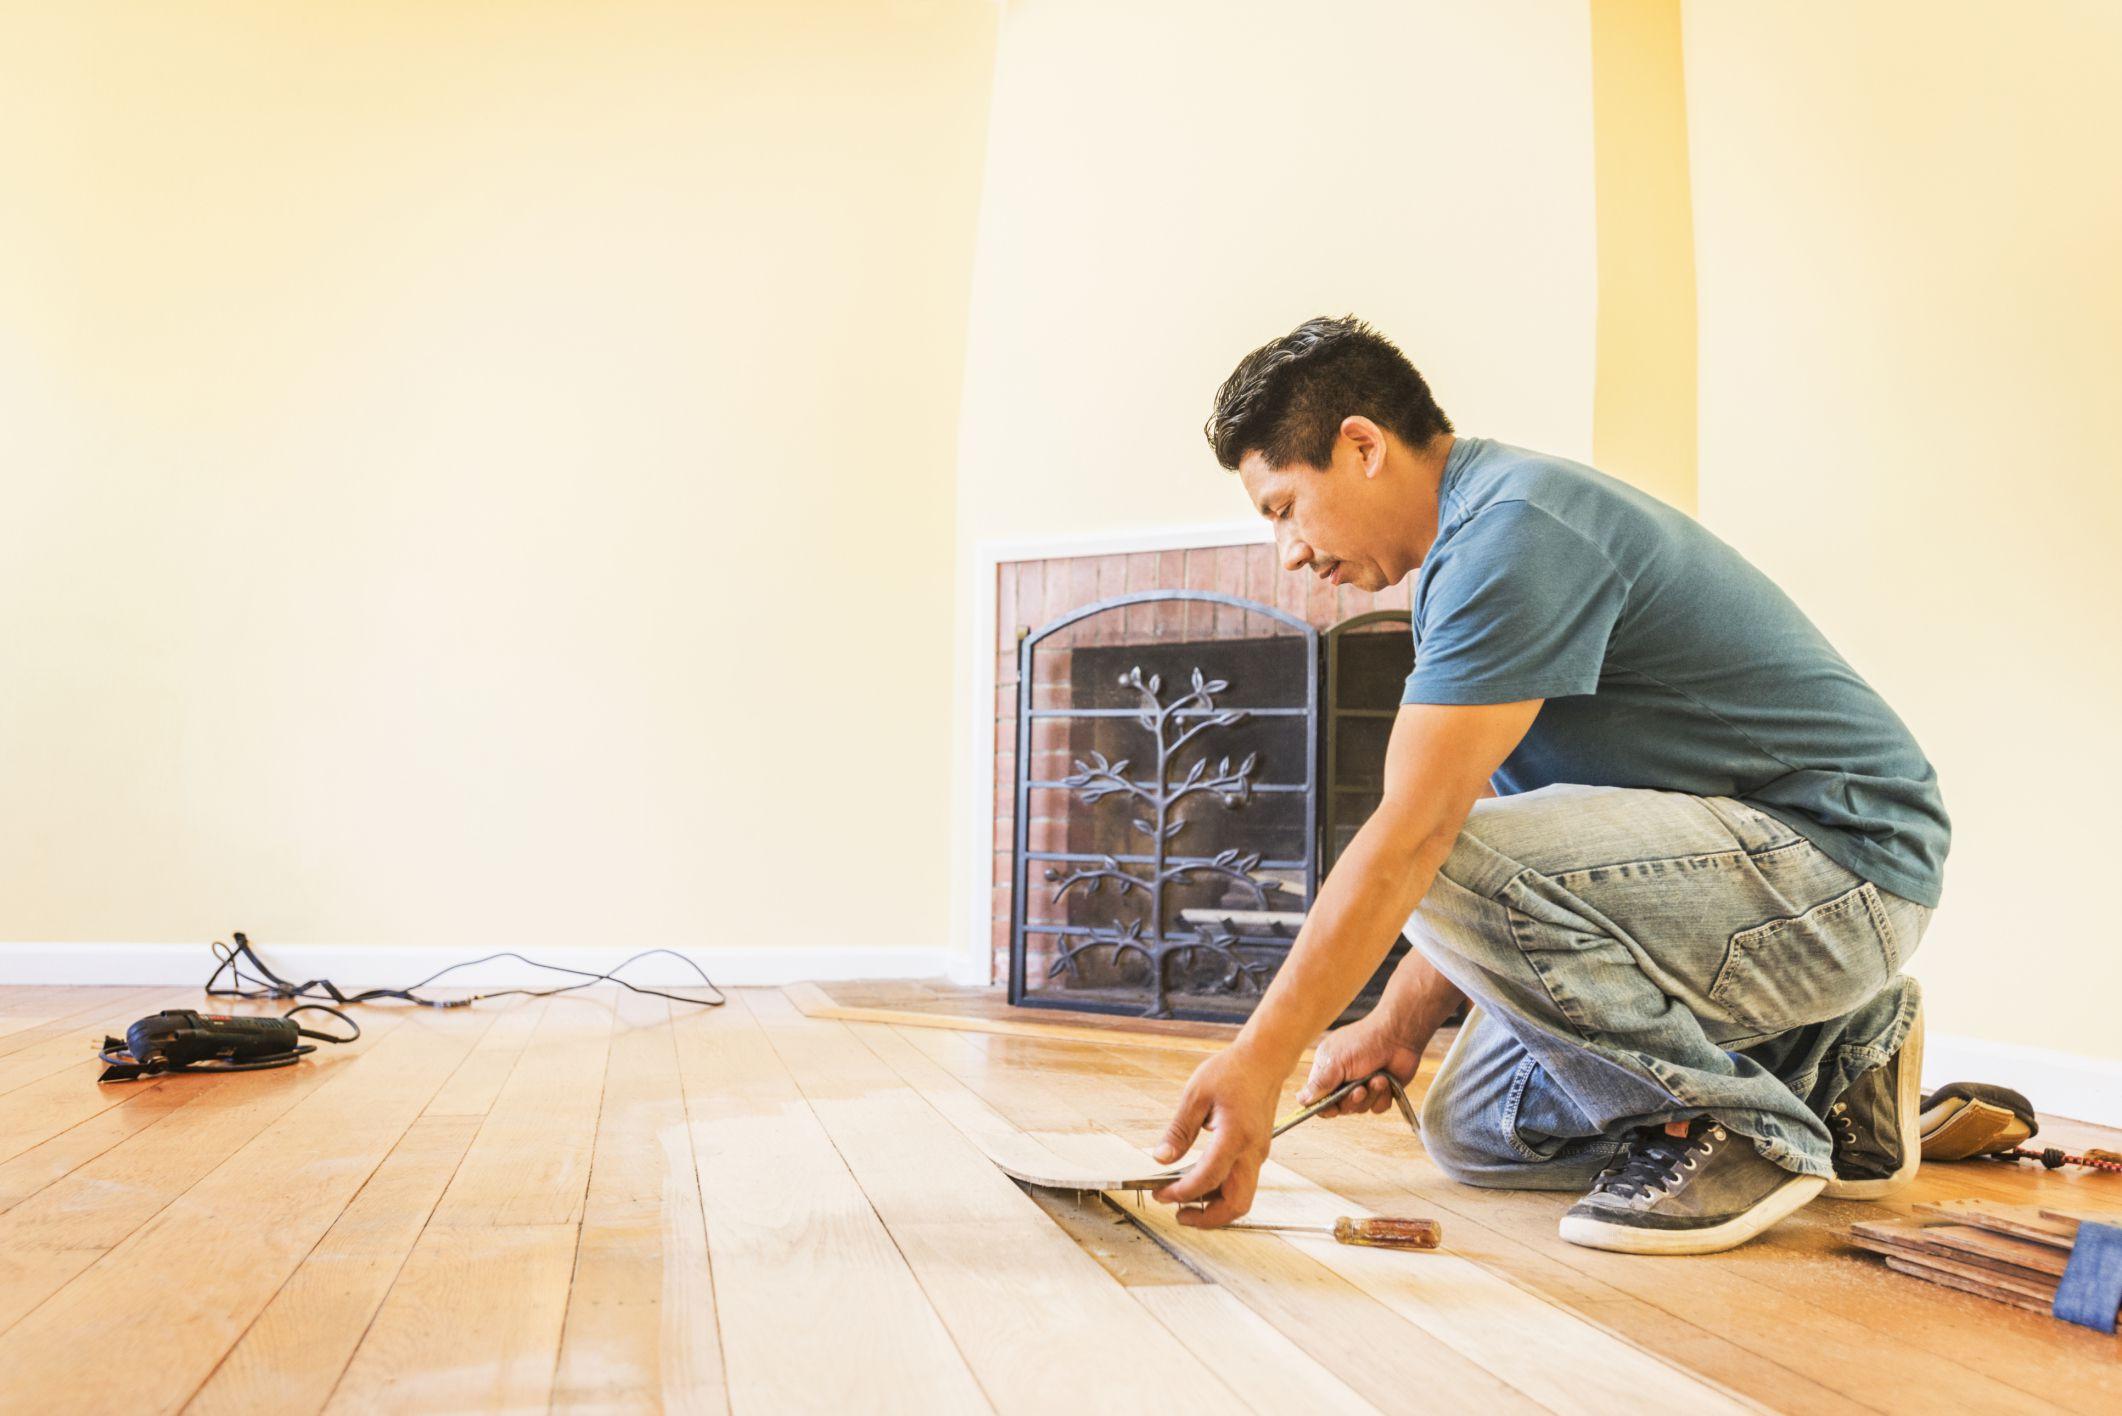 hardwood floor refinishing thunder bay of solid hardwood flooring costs for professional vs diy inside installwoodflooring 592016327 56684d6f3df78ce1610a598a